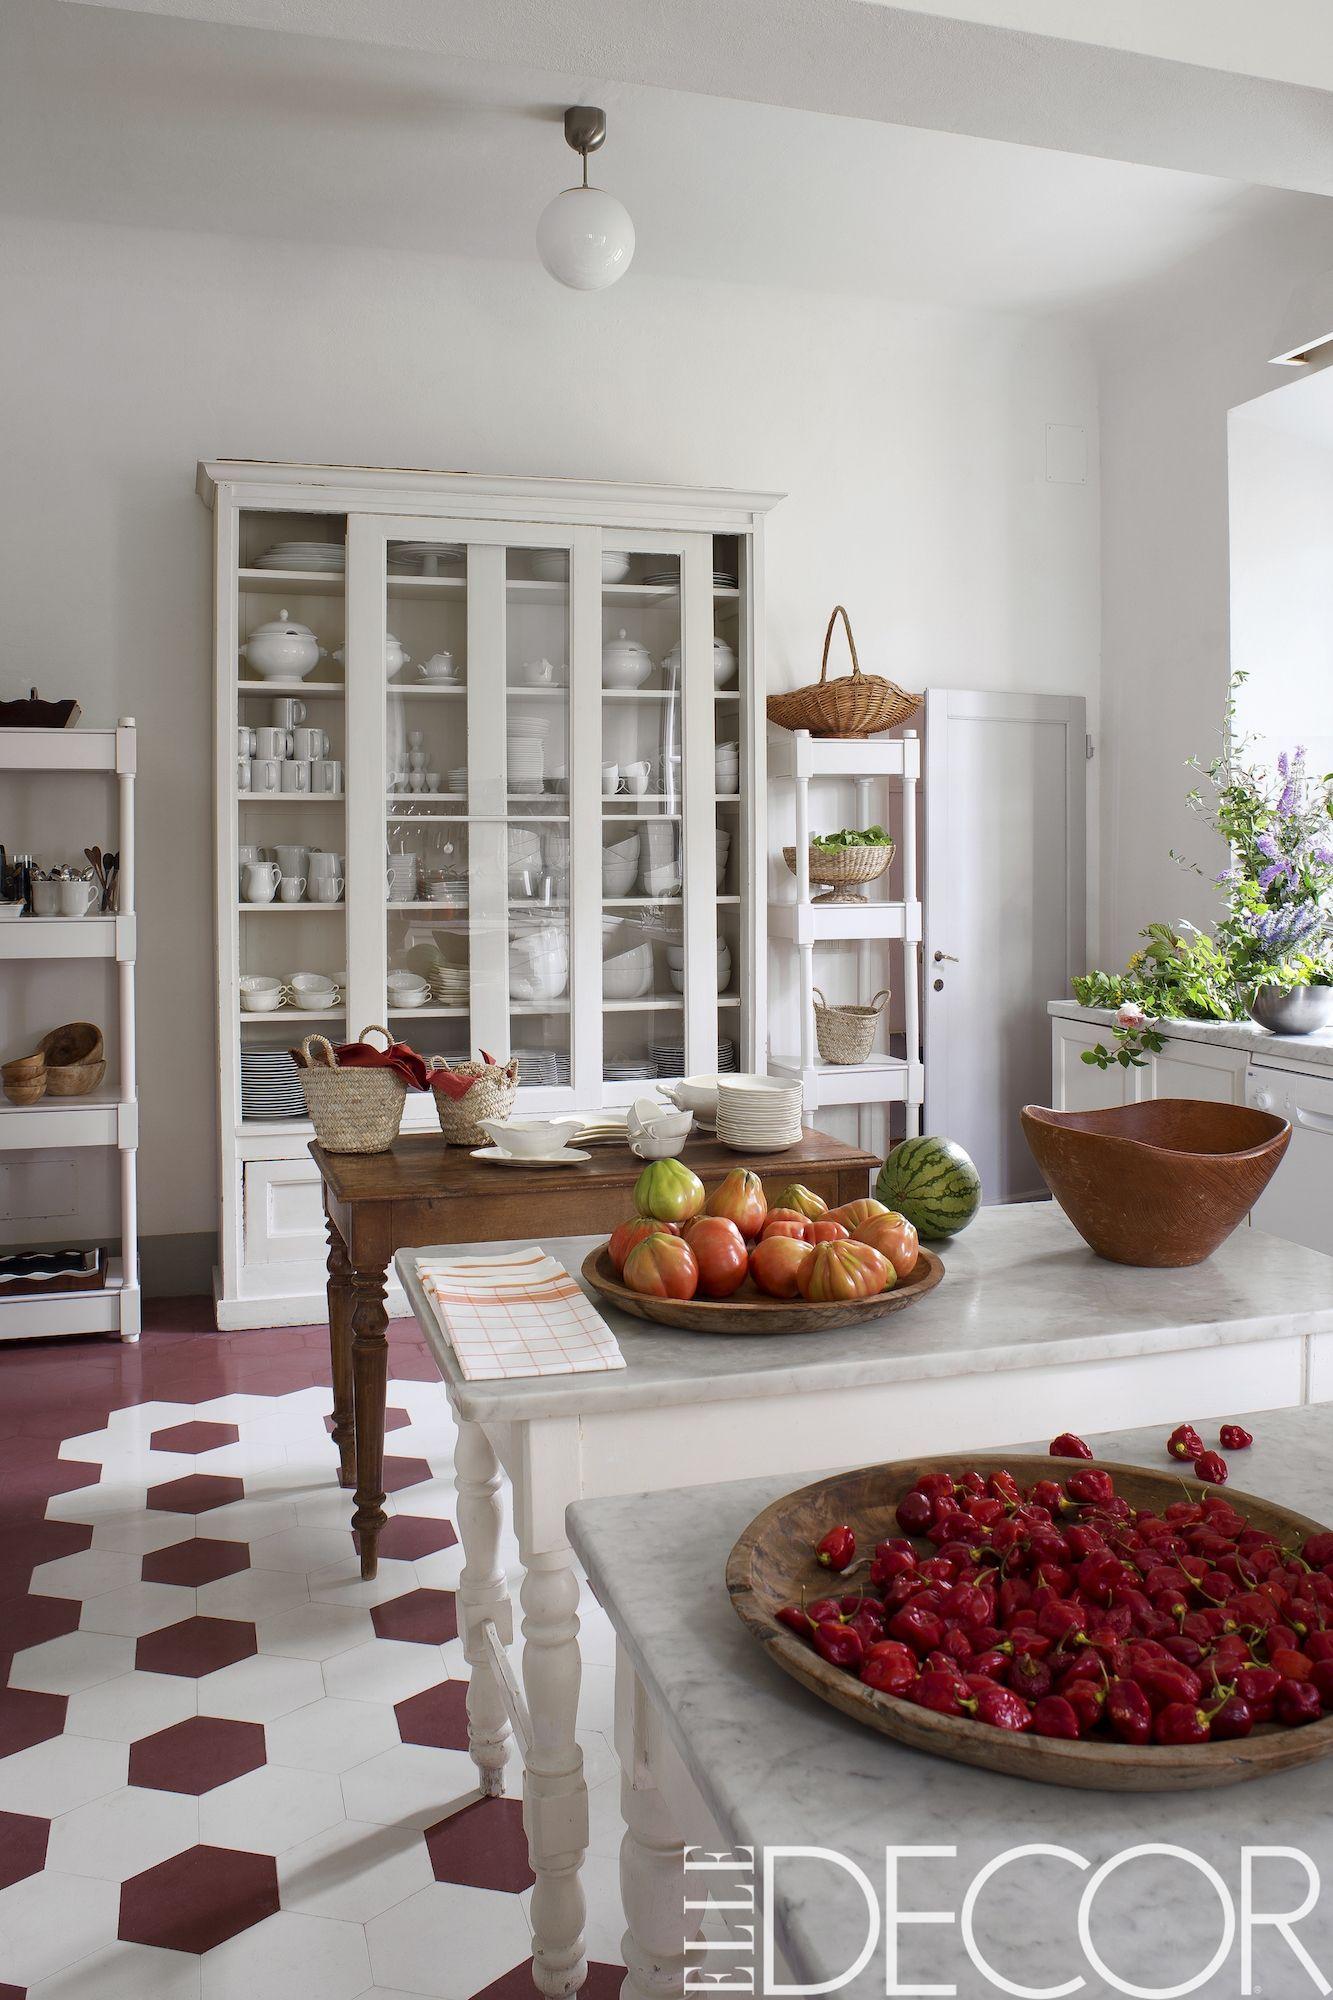 25 Minimalist Kitchen Design Ideas   Pictures Of Minimalism Styled Kitchens